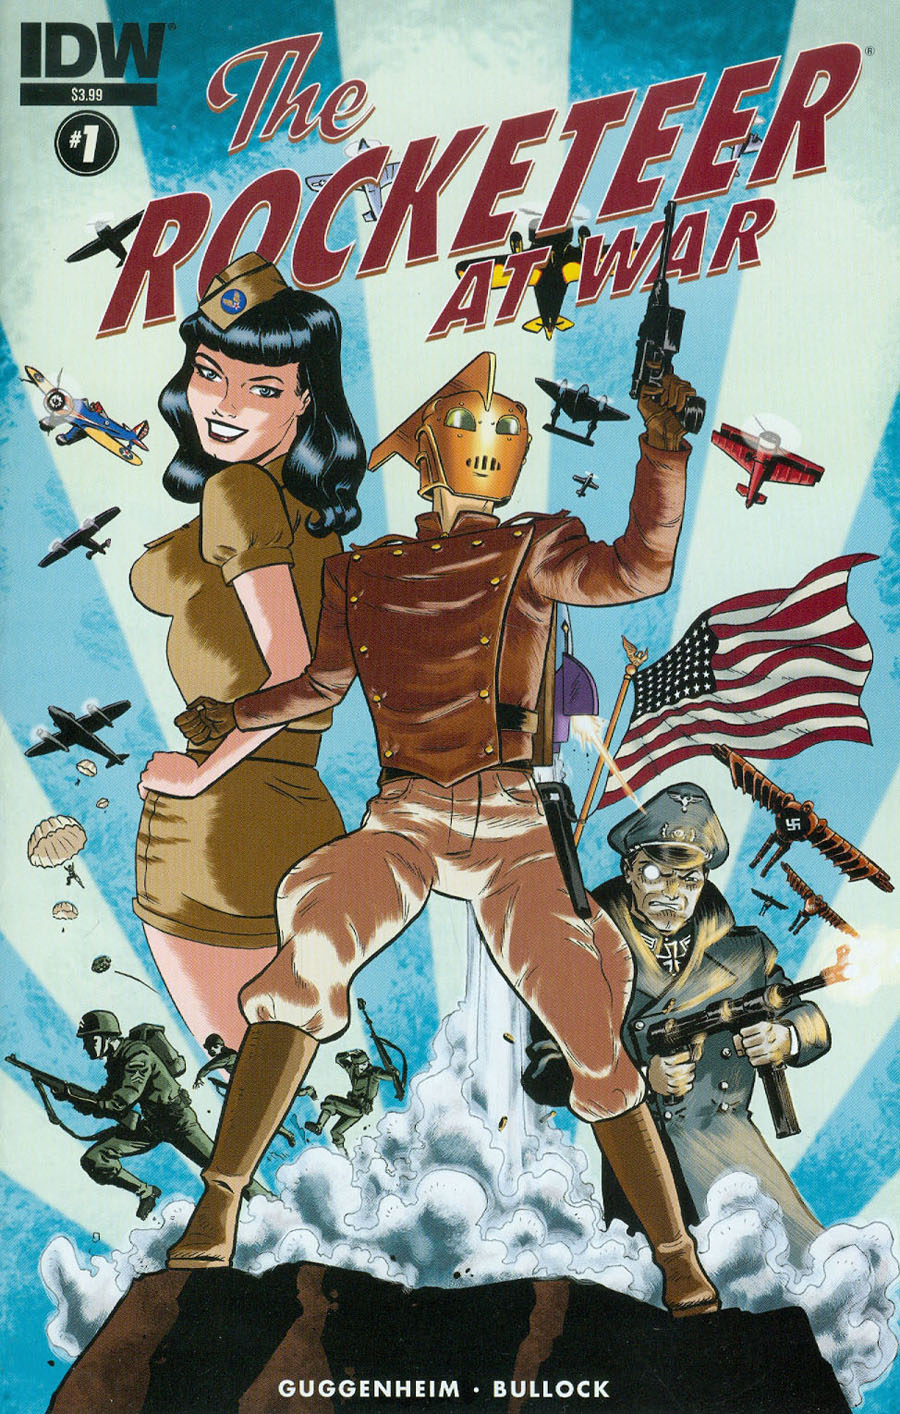 Rocketeer At War #1 Cover A Regular Dave Bullock Cover